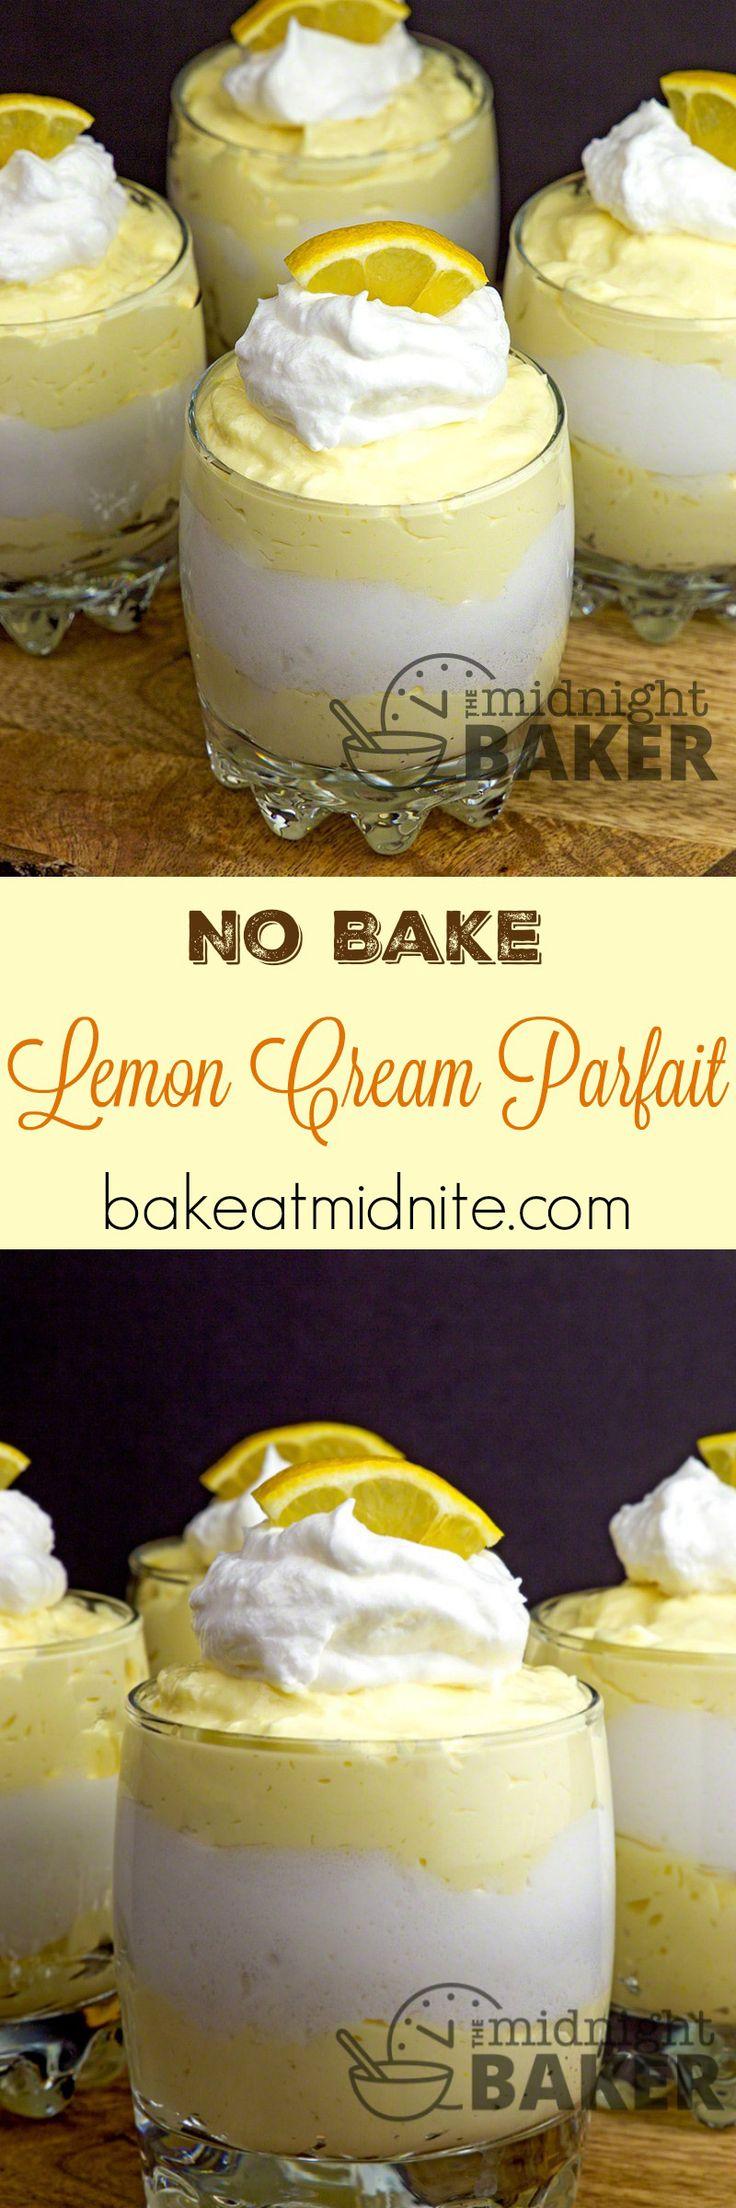 This no-bake creamy lemon dessert is full of lemony flavor with a velvety texture